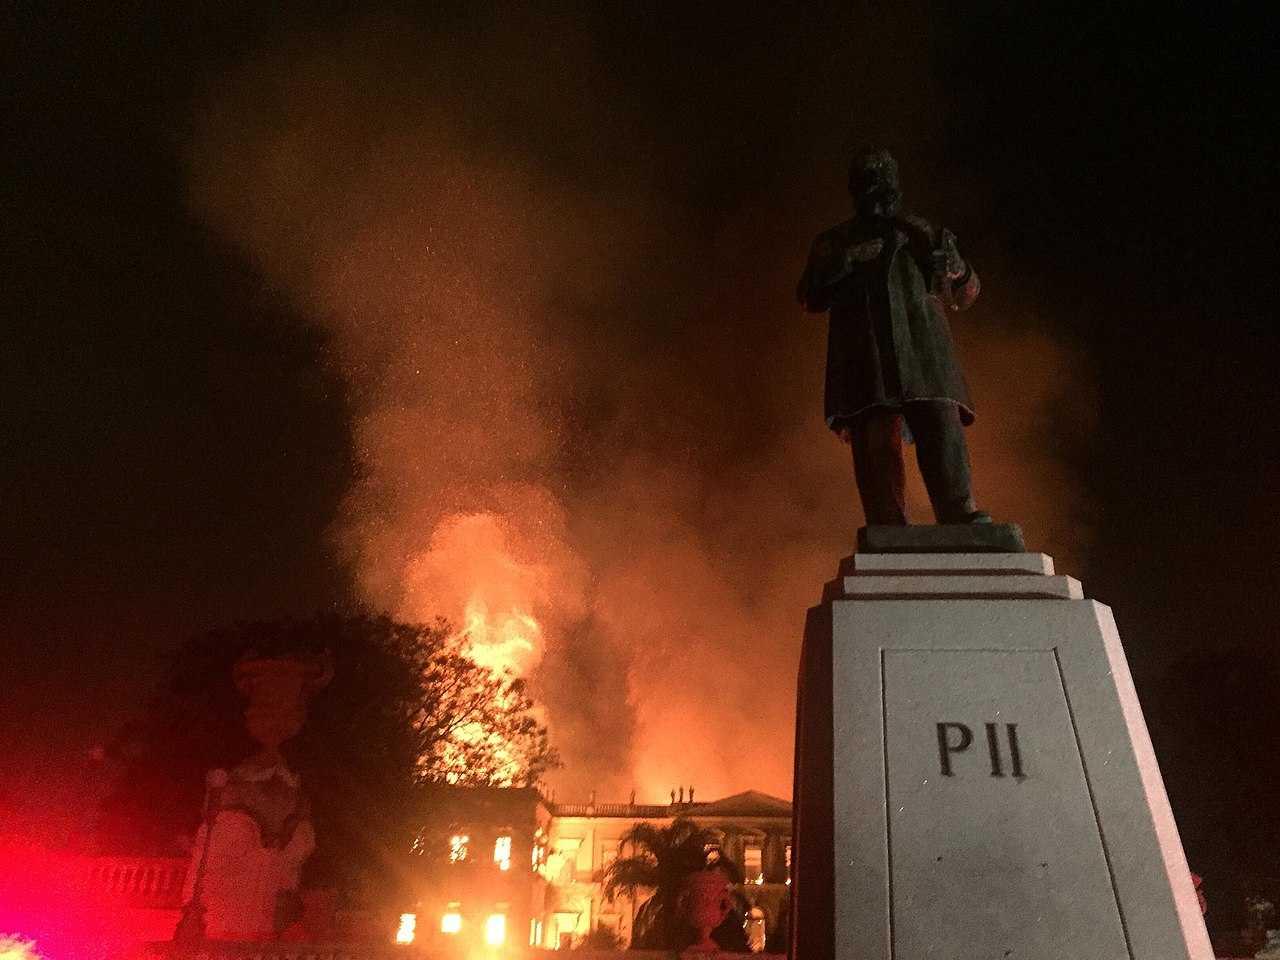 A fire destroys the National Museum of Brazil in Rio de Janeiro